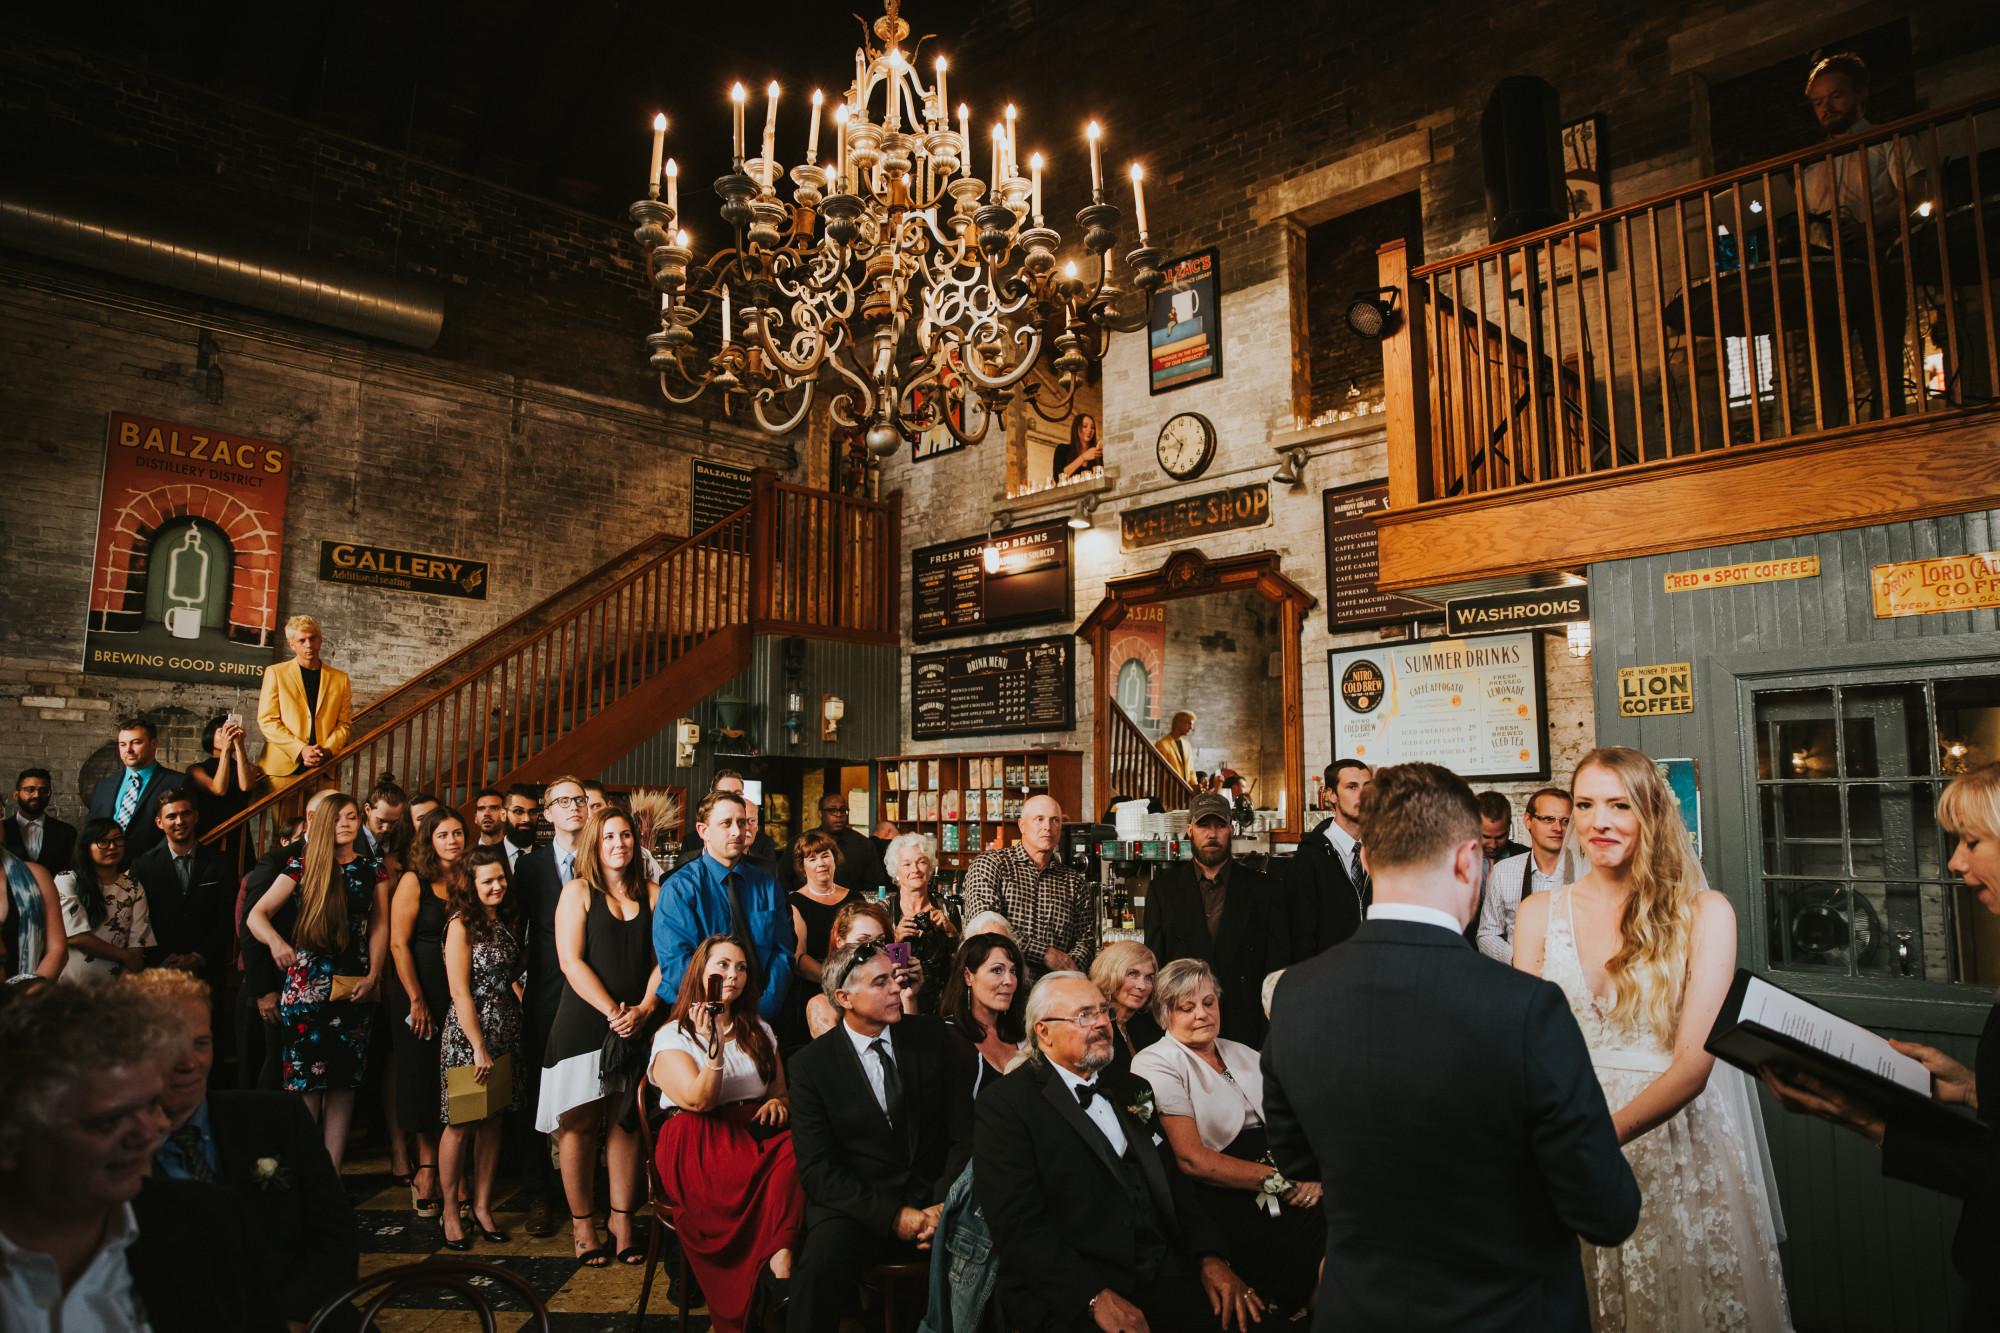 Beth-Ted-Balzacs-Coffee-Distillery-District-Toronto-Wedding-Planning-INLY-Events-Lushana-Bale-Photography-0176.jpg